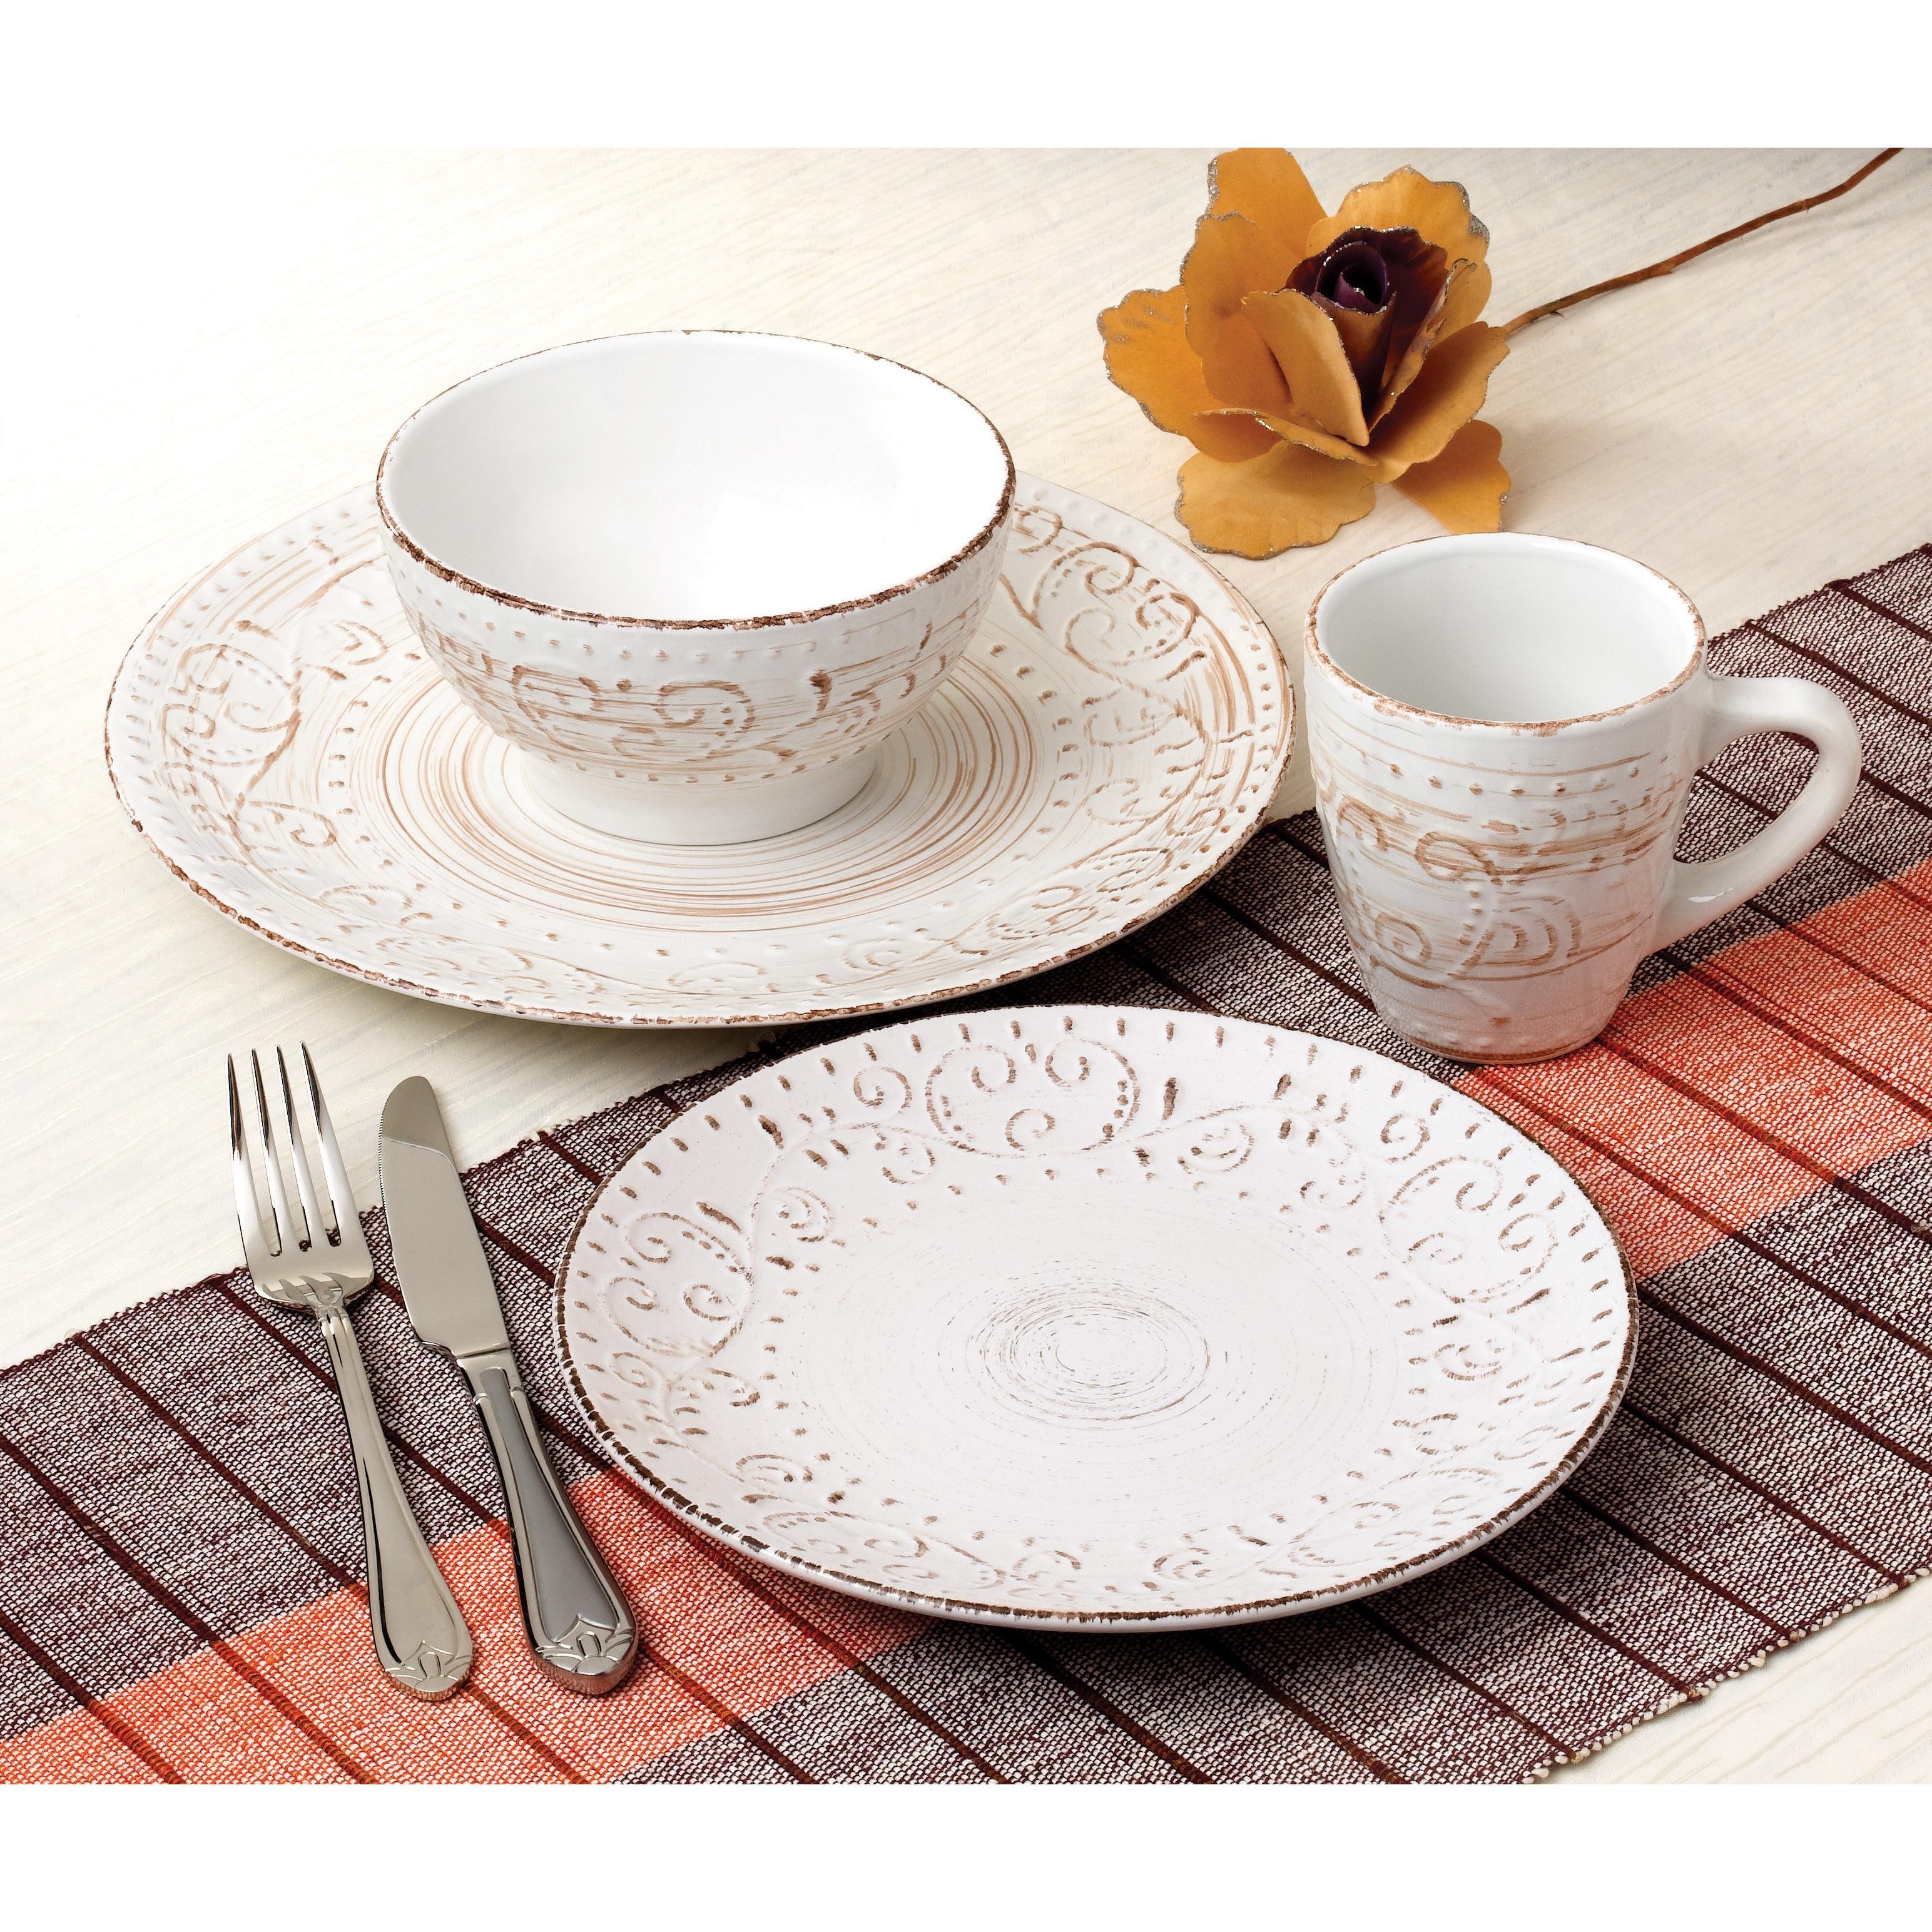 Lorren Home Trends Round 16-piece Distressed White Stoneware Dinnerware Set - Free Shipping Today - Overstock - 18807021  sc 1 st  Overstock.com & Lorren Home Trends Round 16-piece Distressed White Stoneware ...